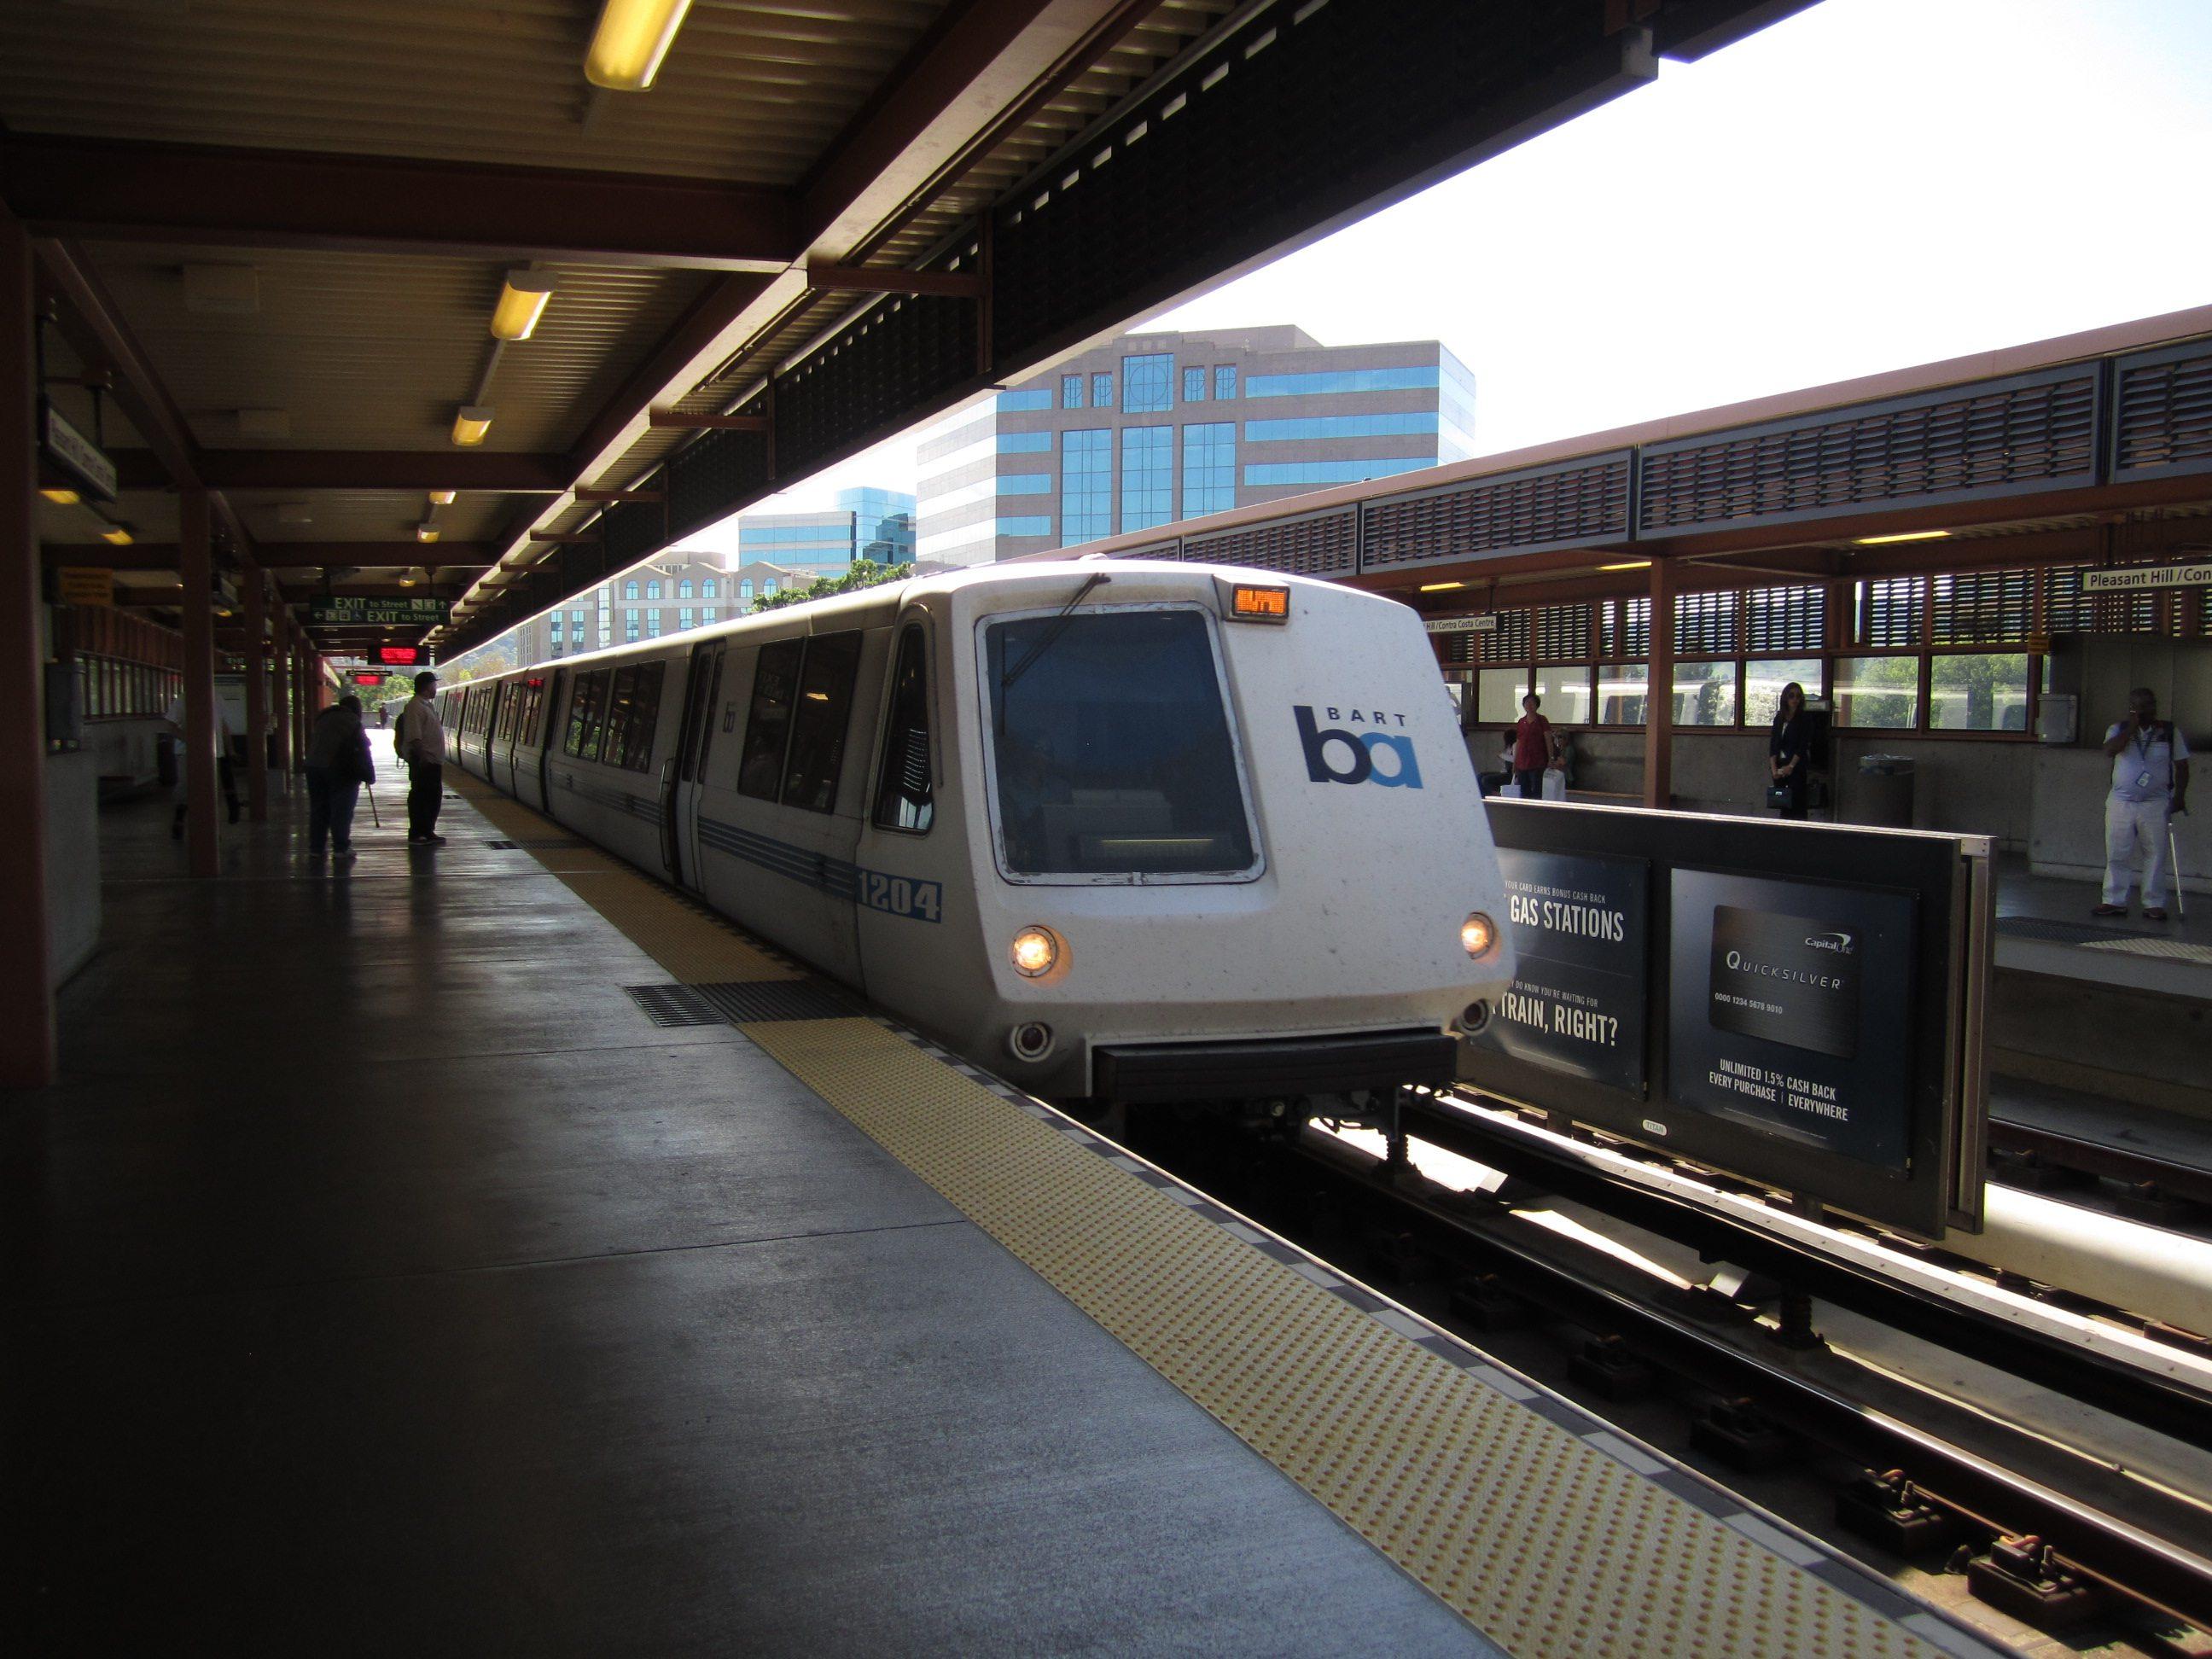 BART_Train_at_Pleasant_Hill_Station